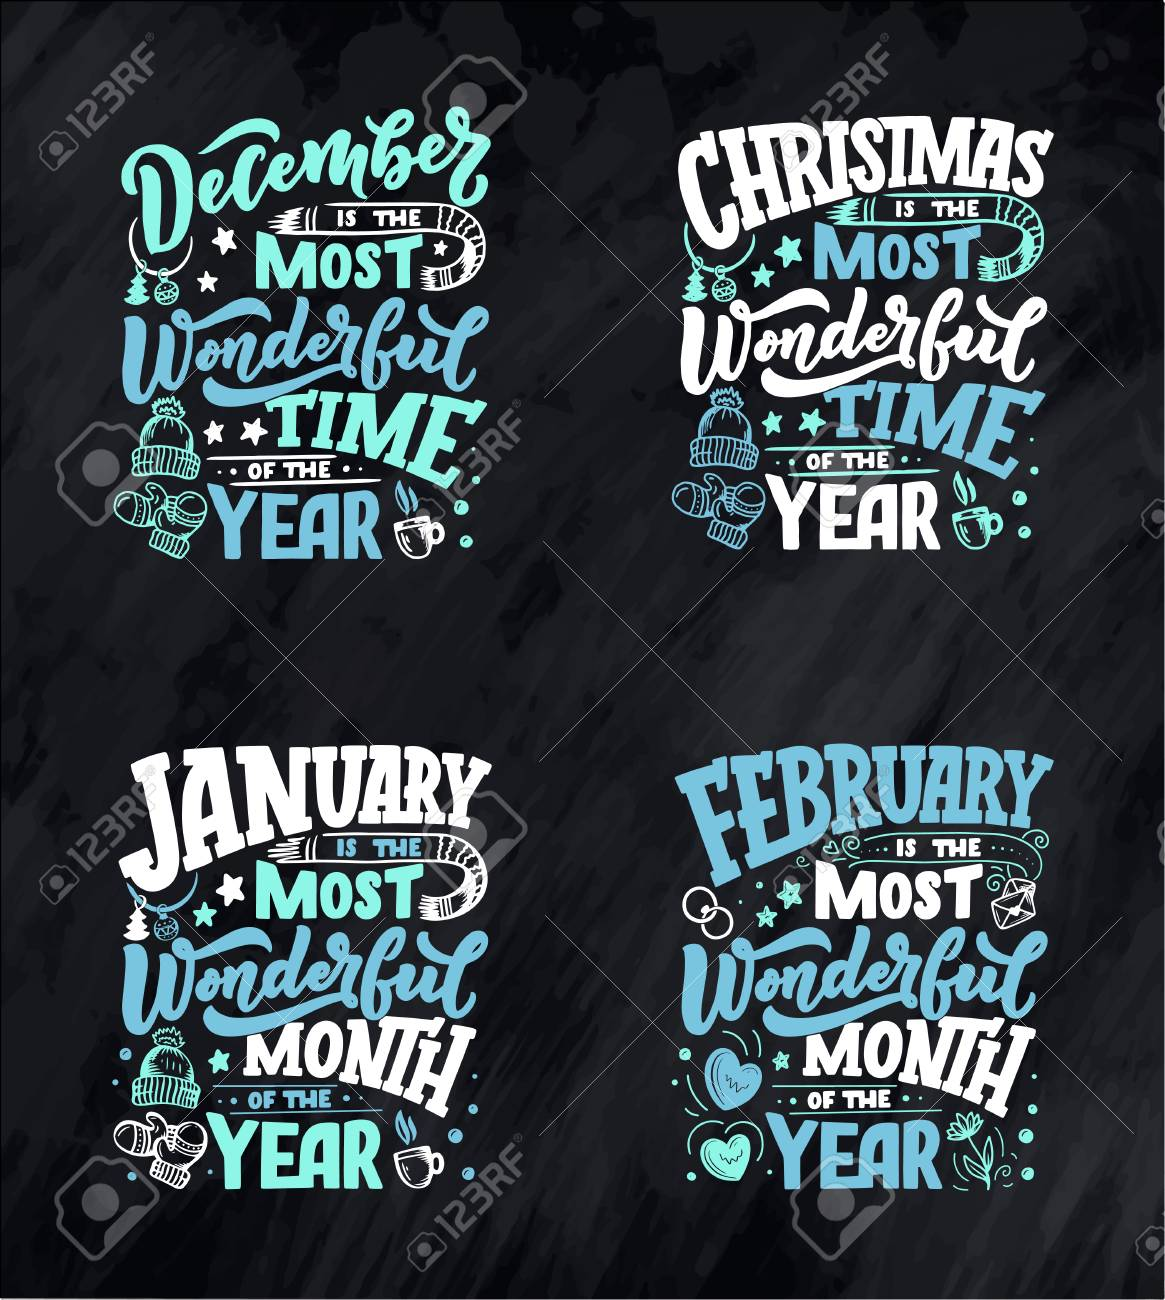 christmas inspirational quotes